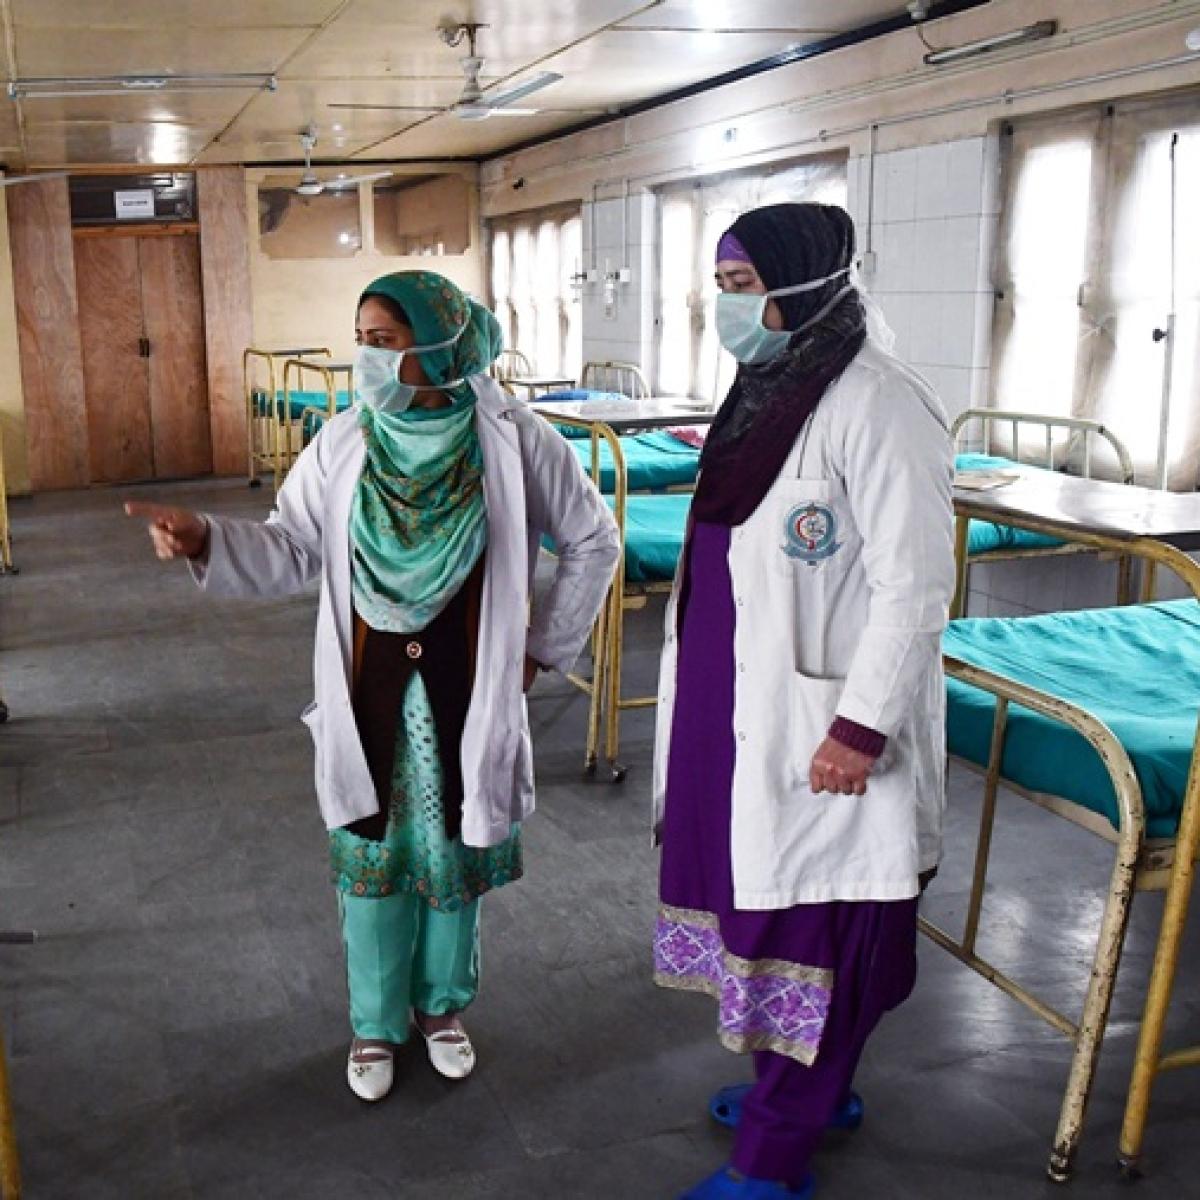 Latest coronavirus update in India: 68-year-old woman dies of coronavirus in Delhi; second casualty in country